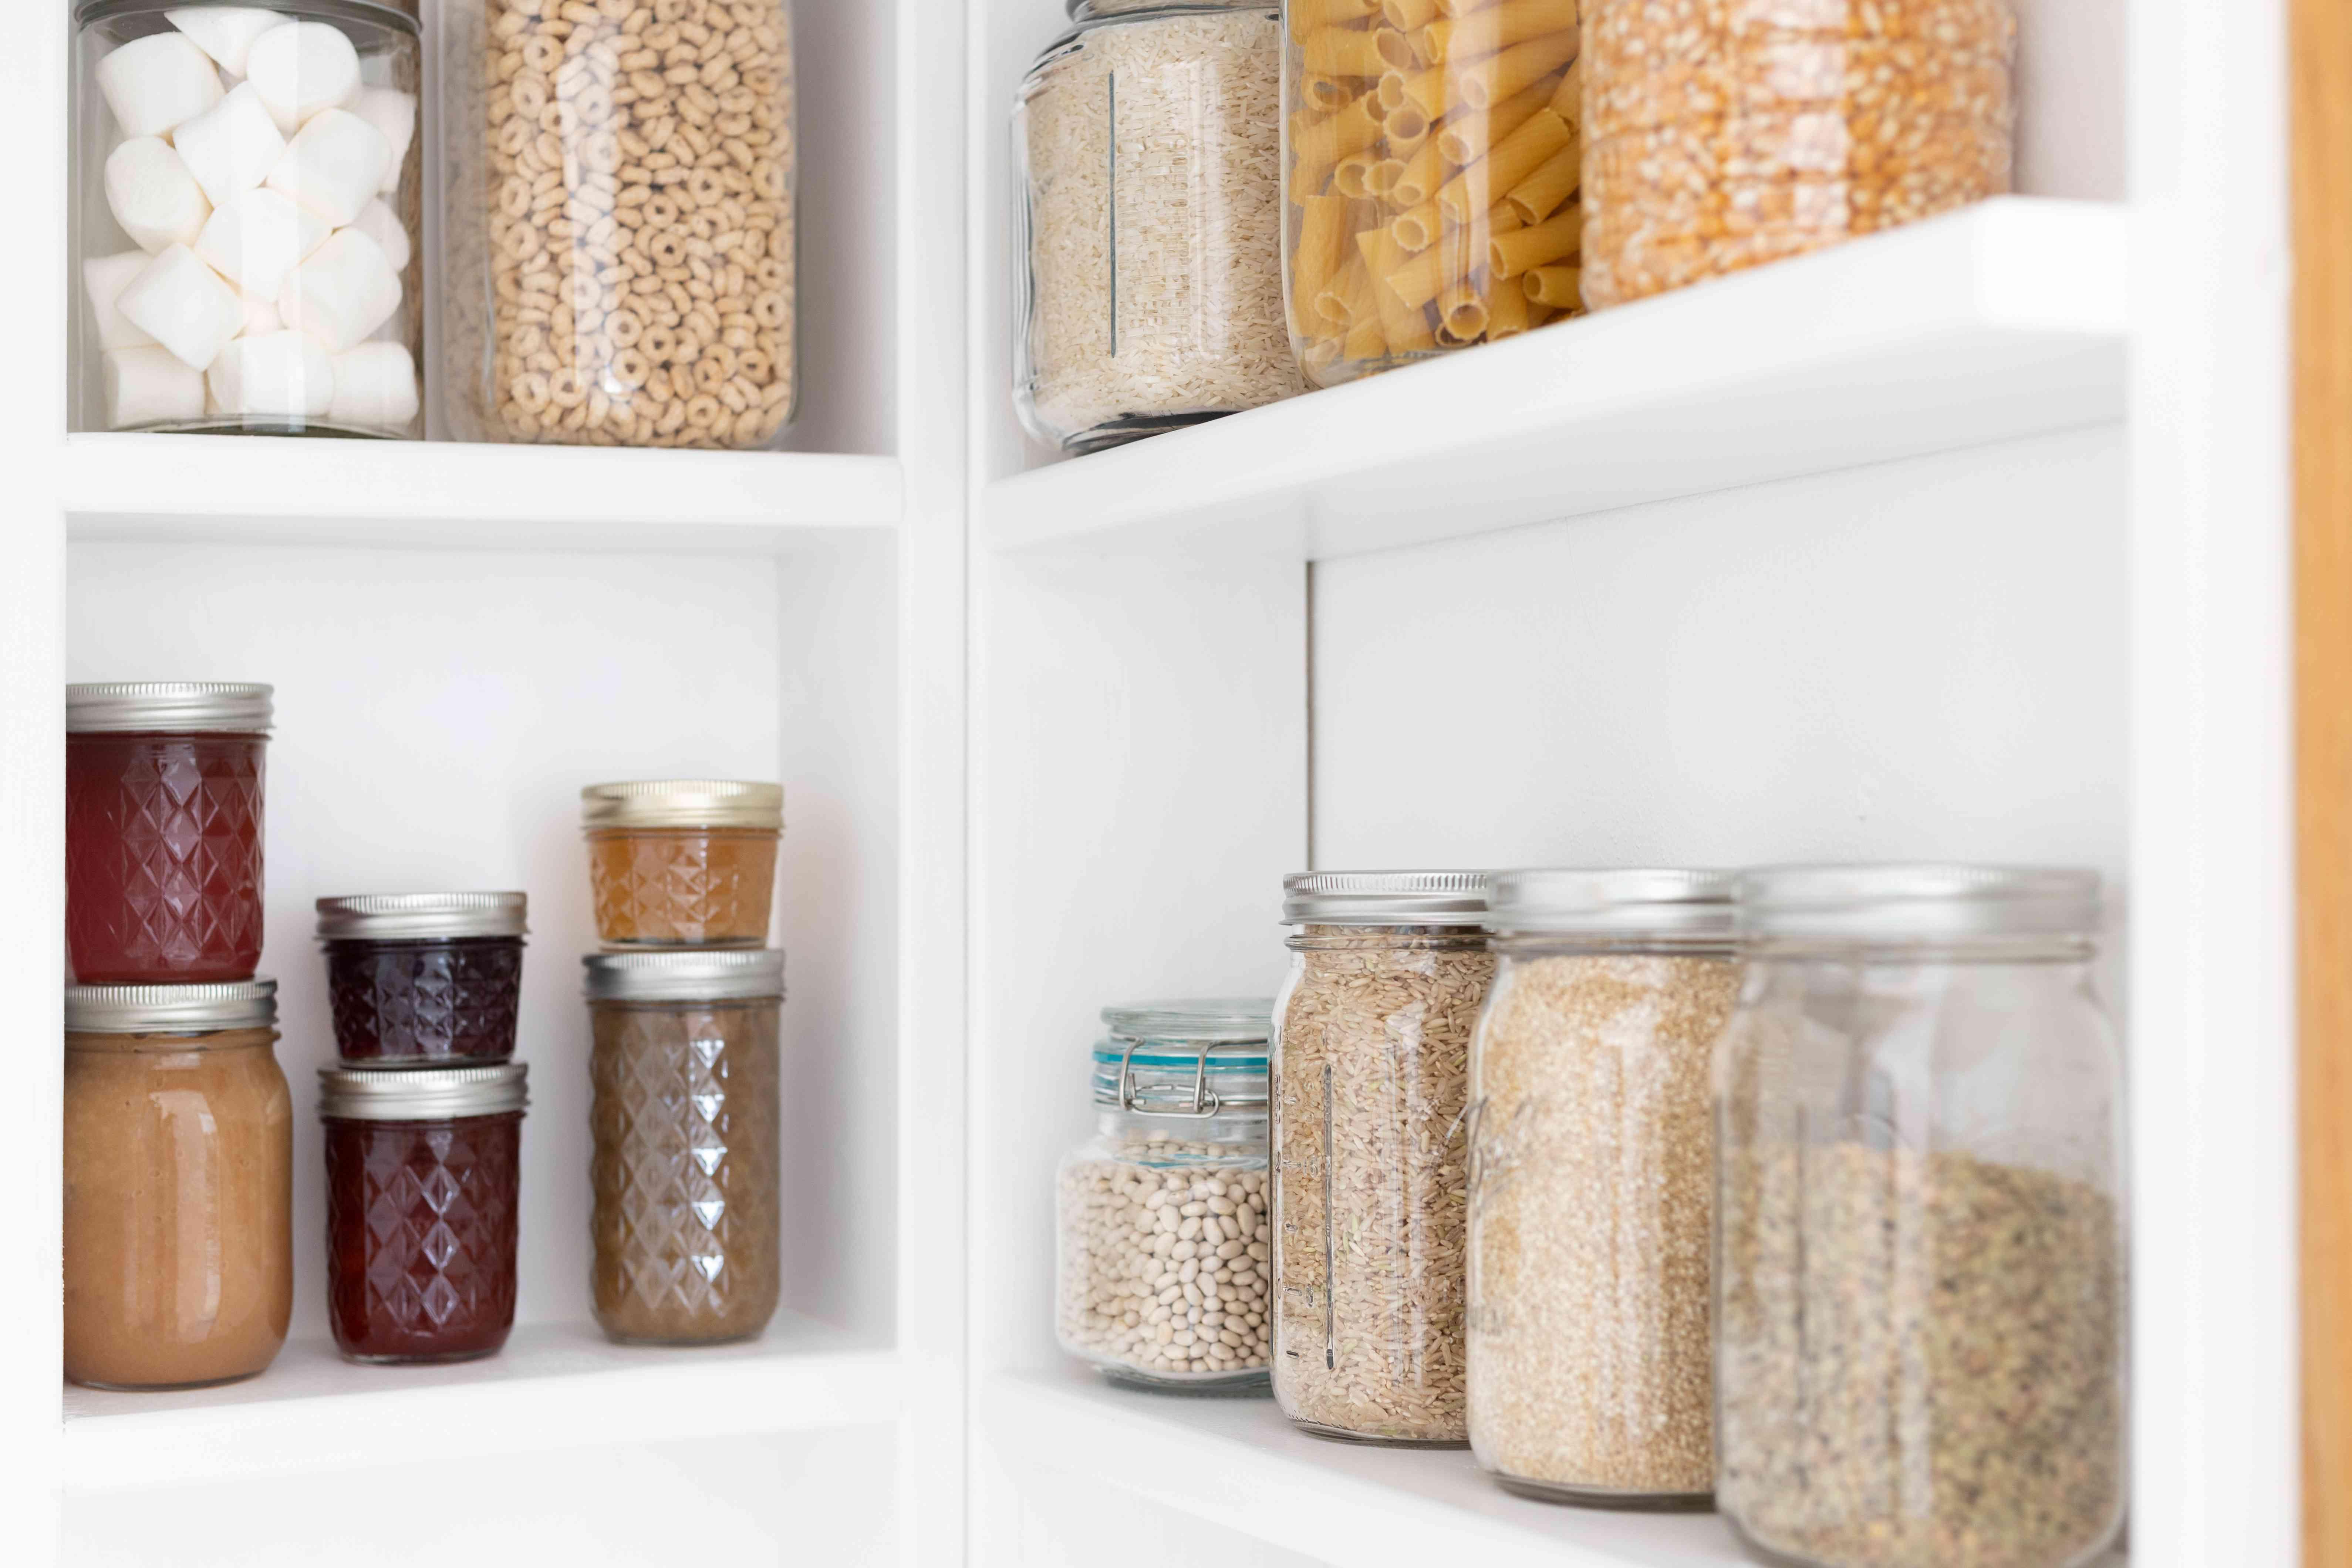 shelving inside a pantry